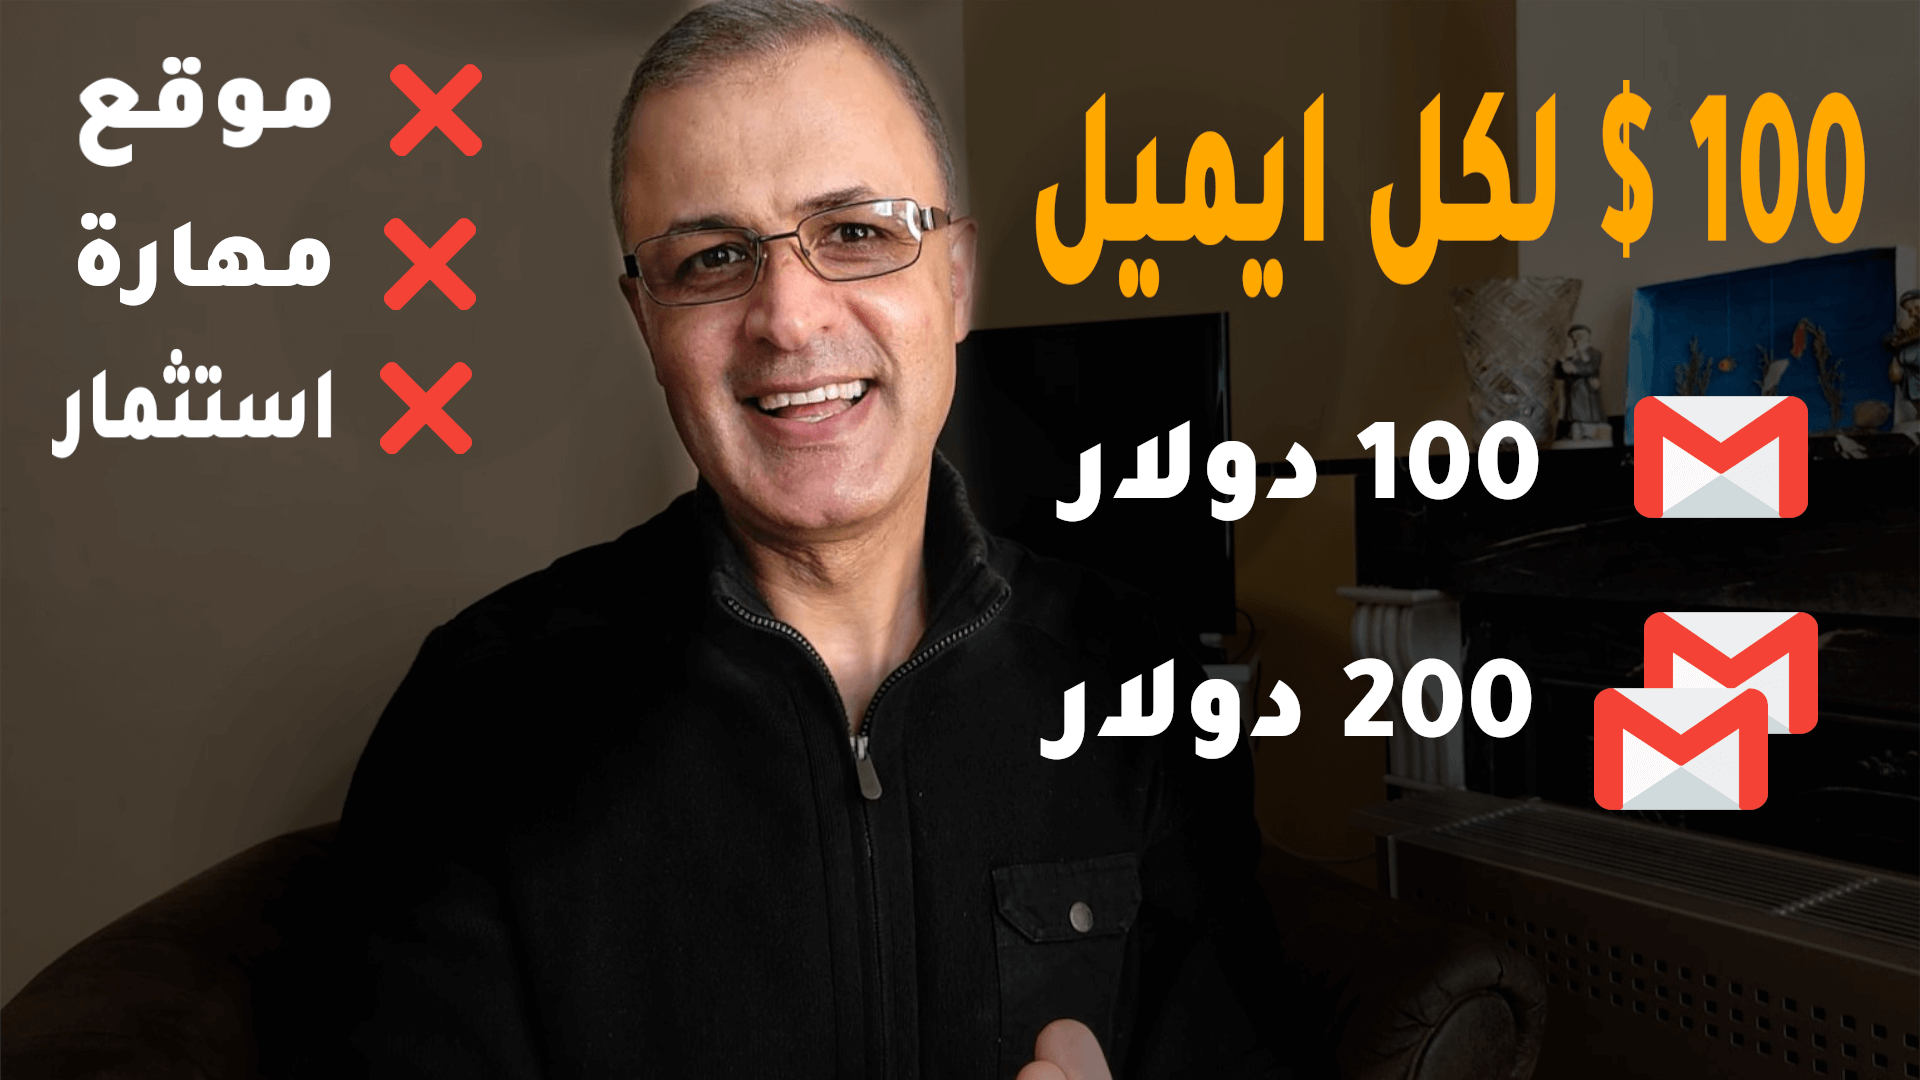 You are currently viewing الربح من الايميل ماركتنج